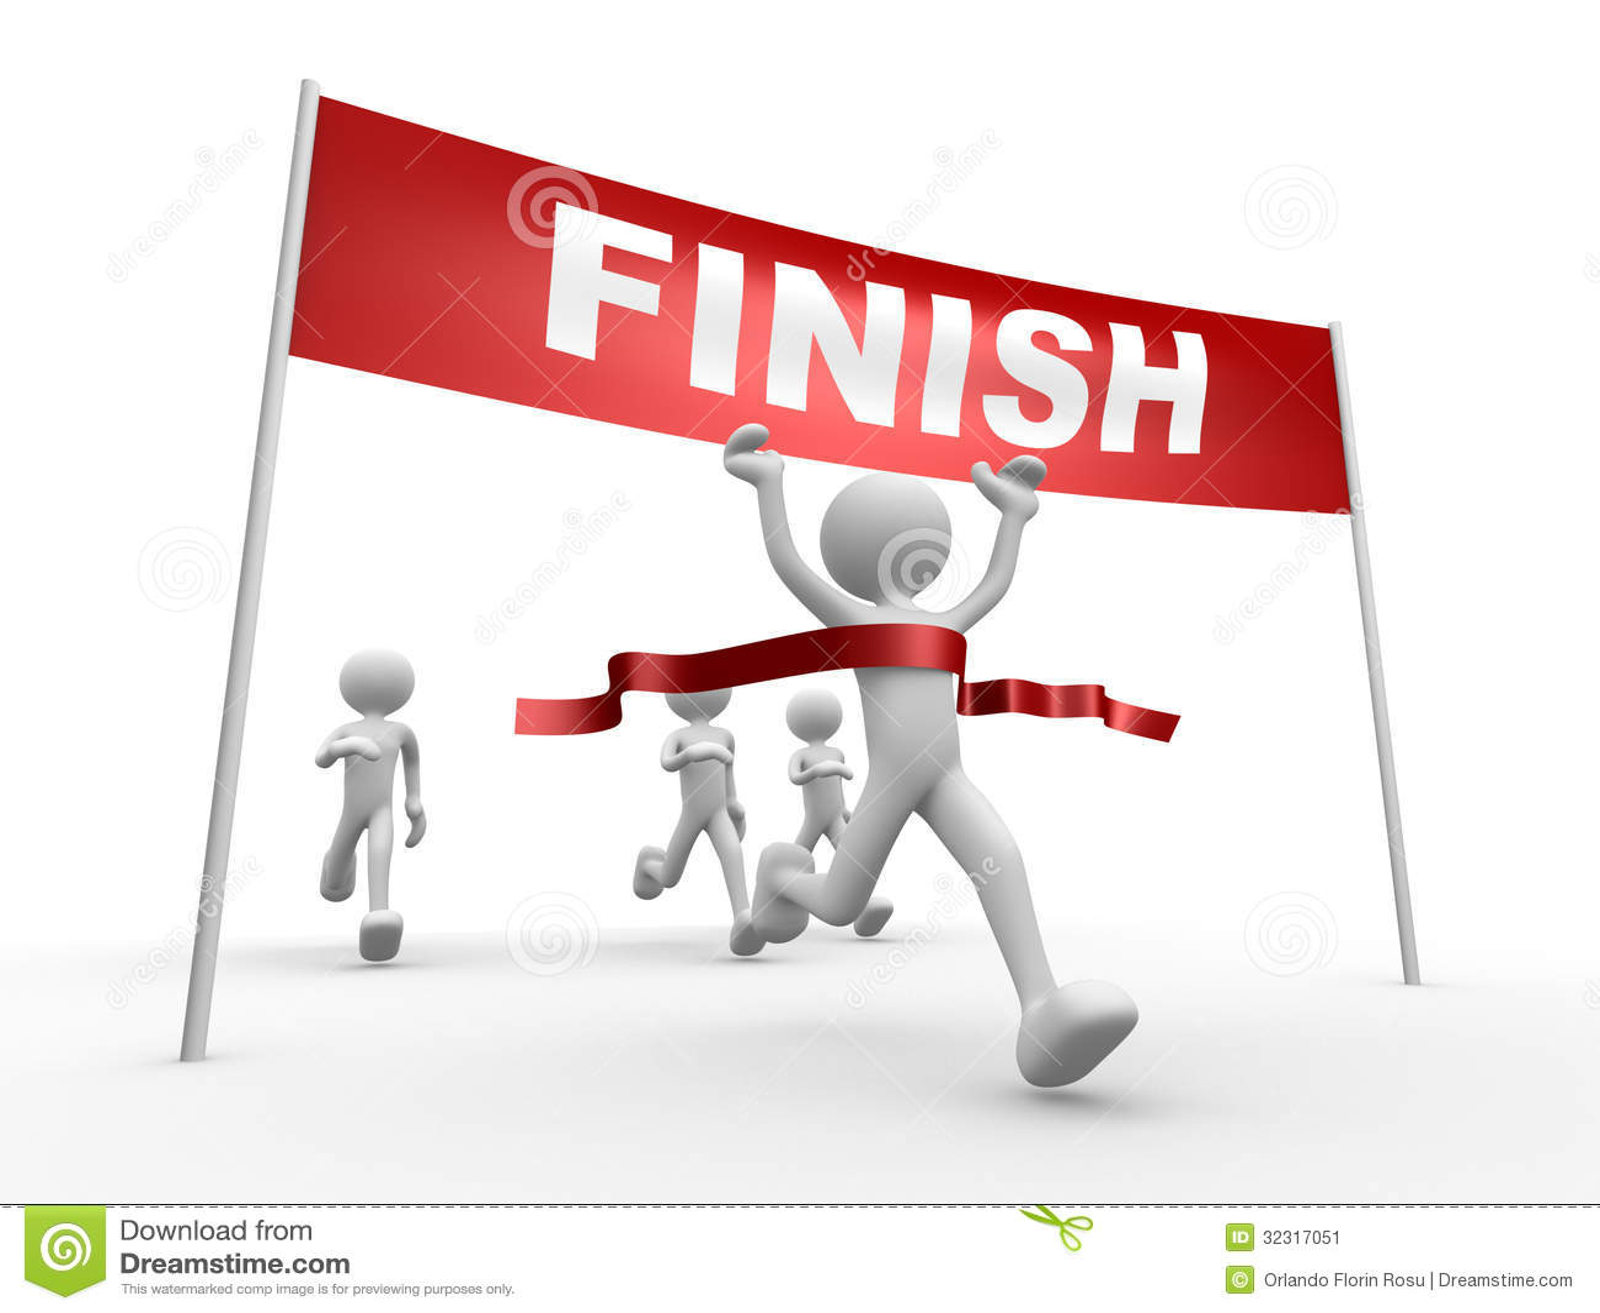 finish line stock illustration illustration of champion triathlon symbols clip art ironman triathlon clipart